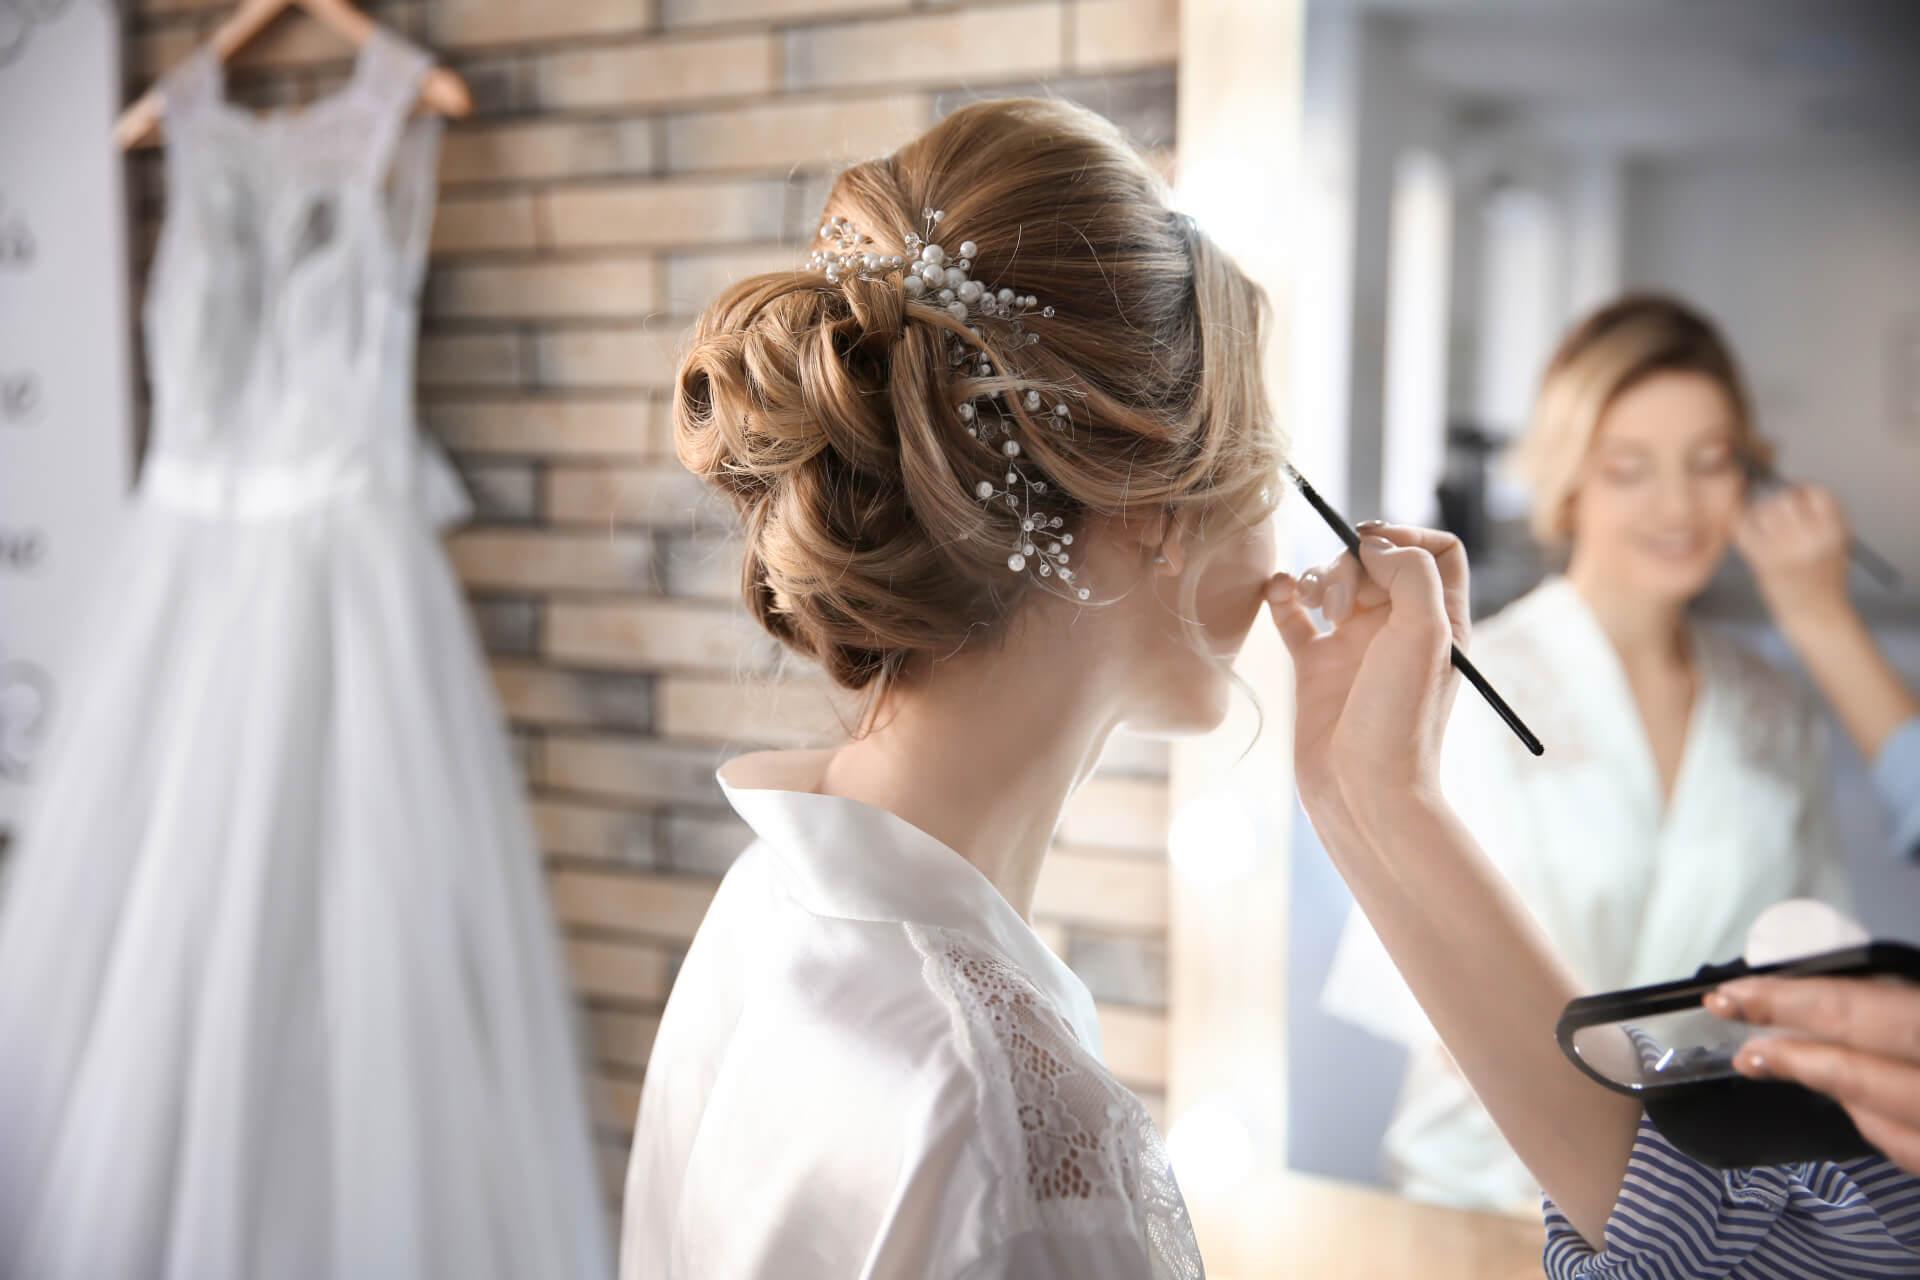 Maquilladores de bodas en Margarita, Venezuela: Expertos en maquillaje para novias en Margarita, profesionales makeup artist